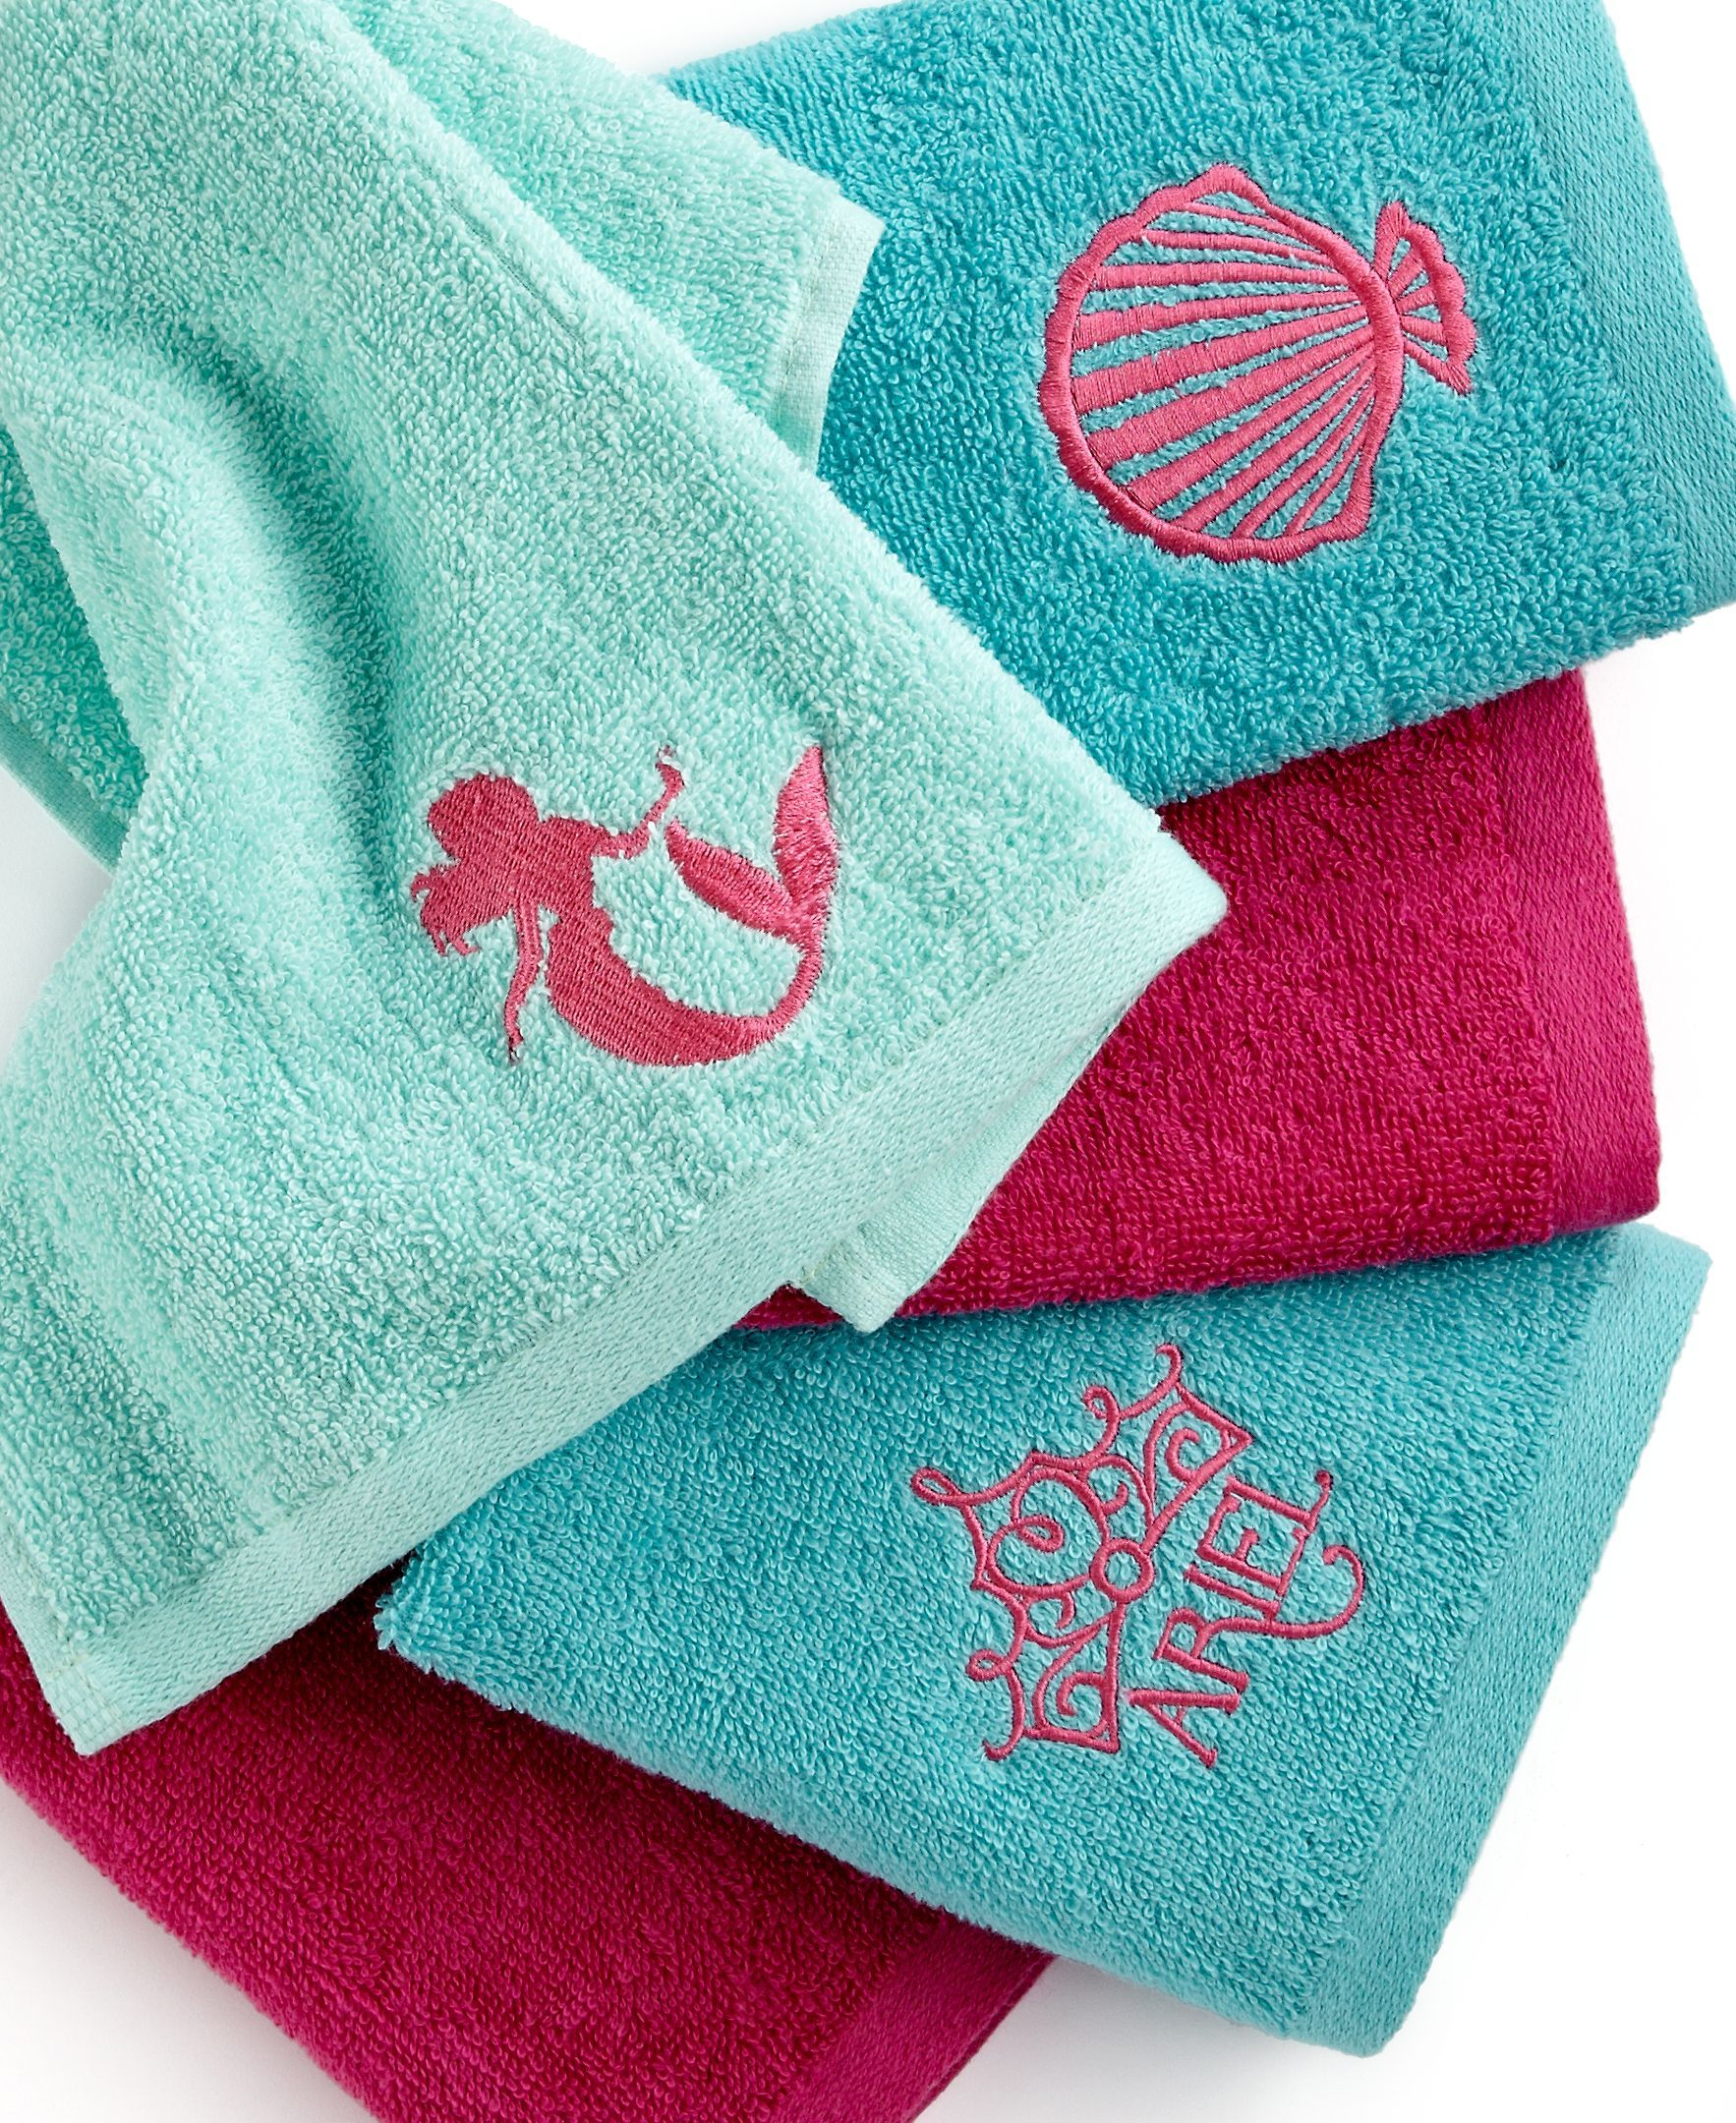 Little mermaid bathroom accessories - Disney Bath Accessories Little Mermaid Shimmer And Gleam 5 Piece Washcloth Set